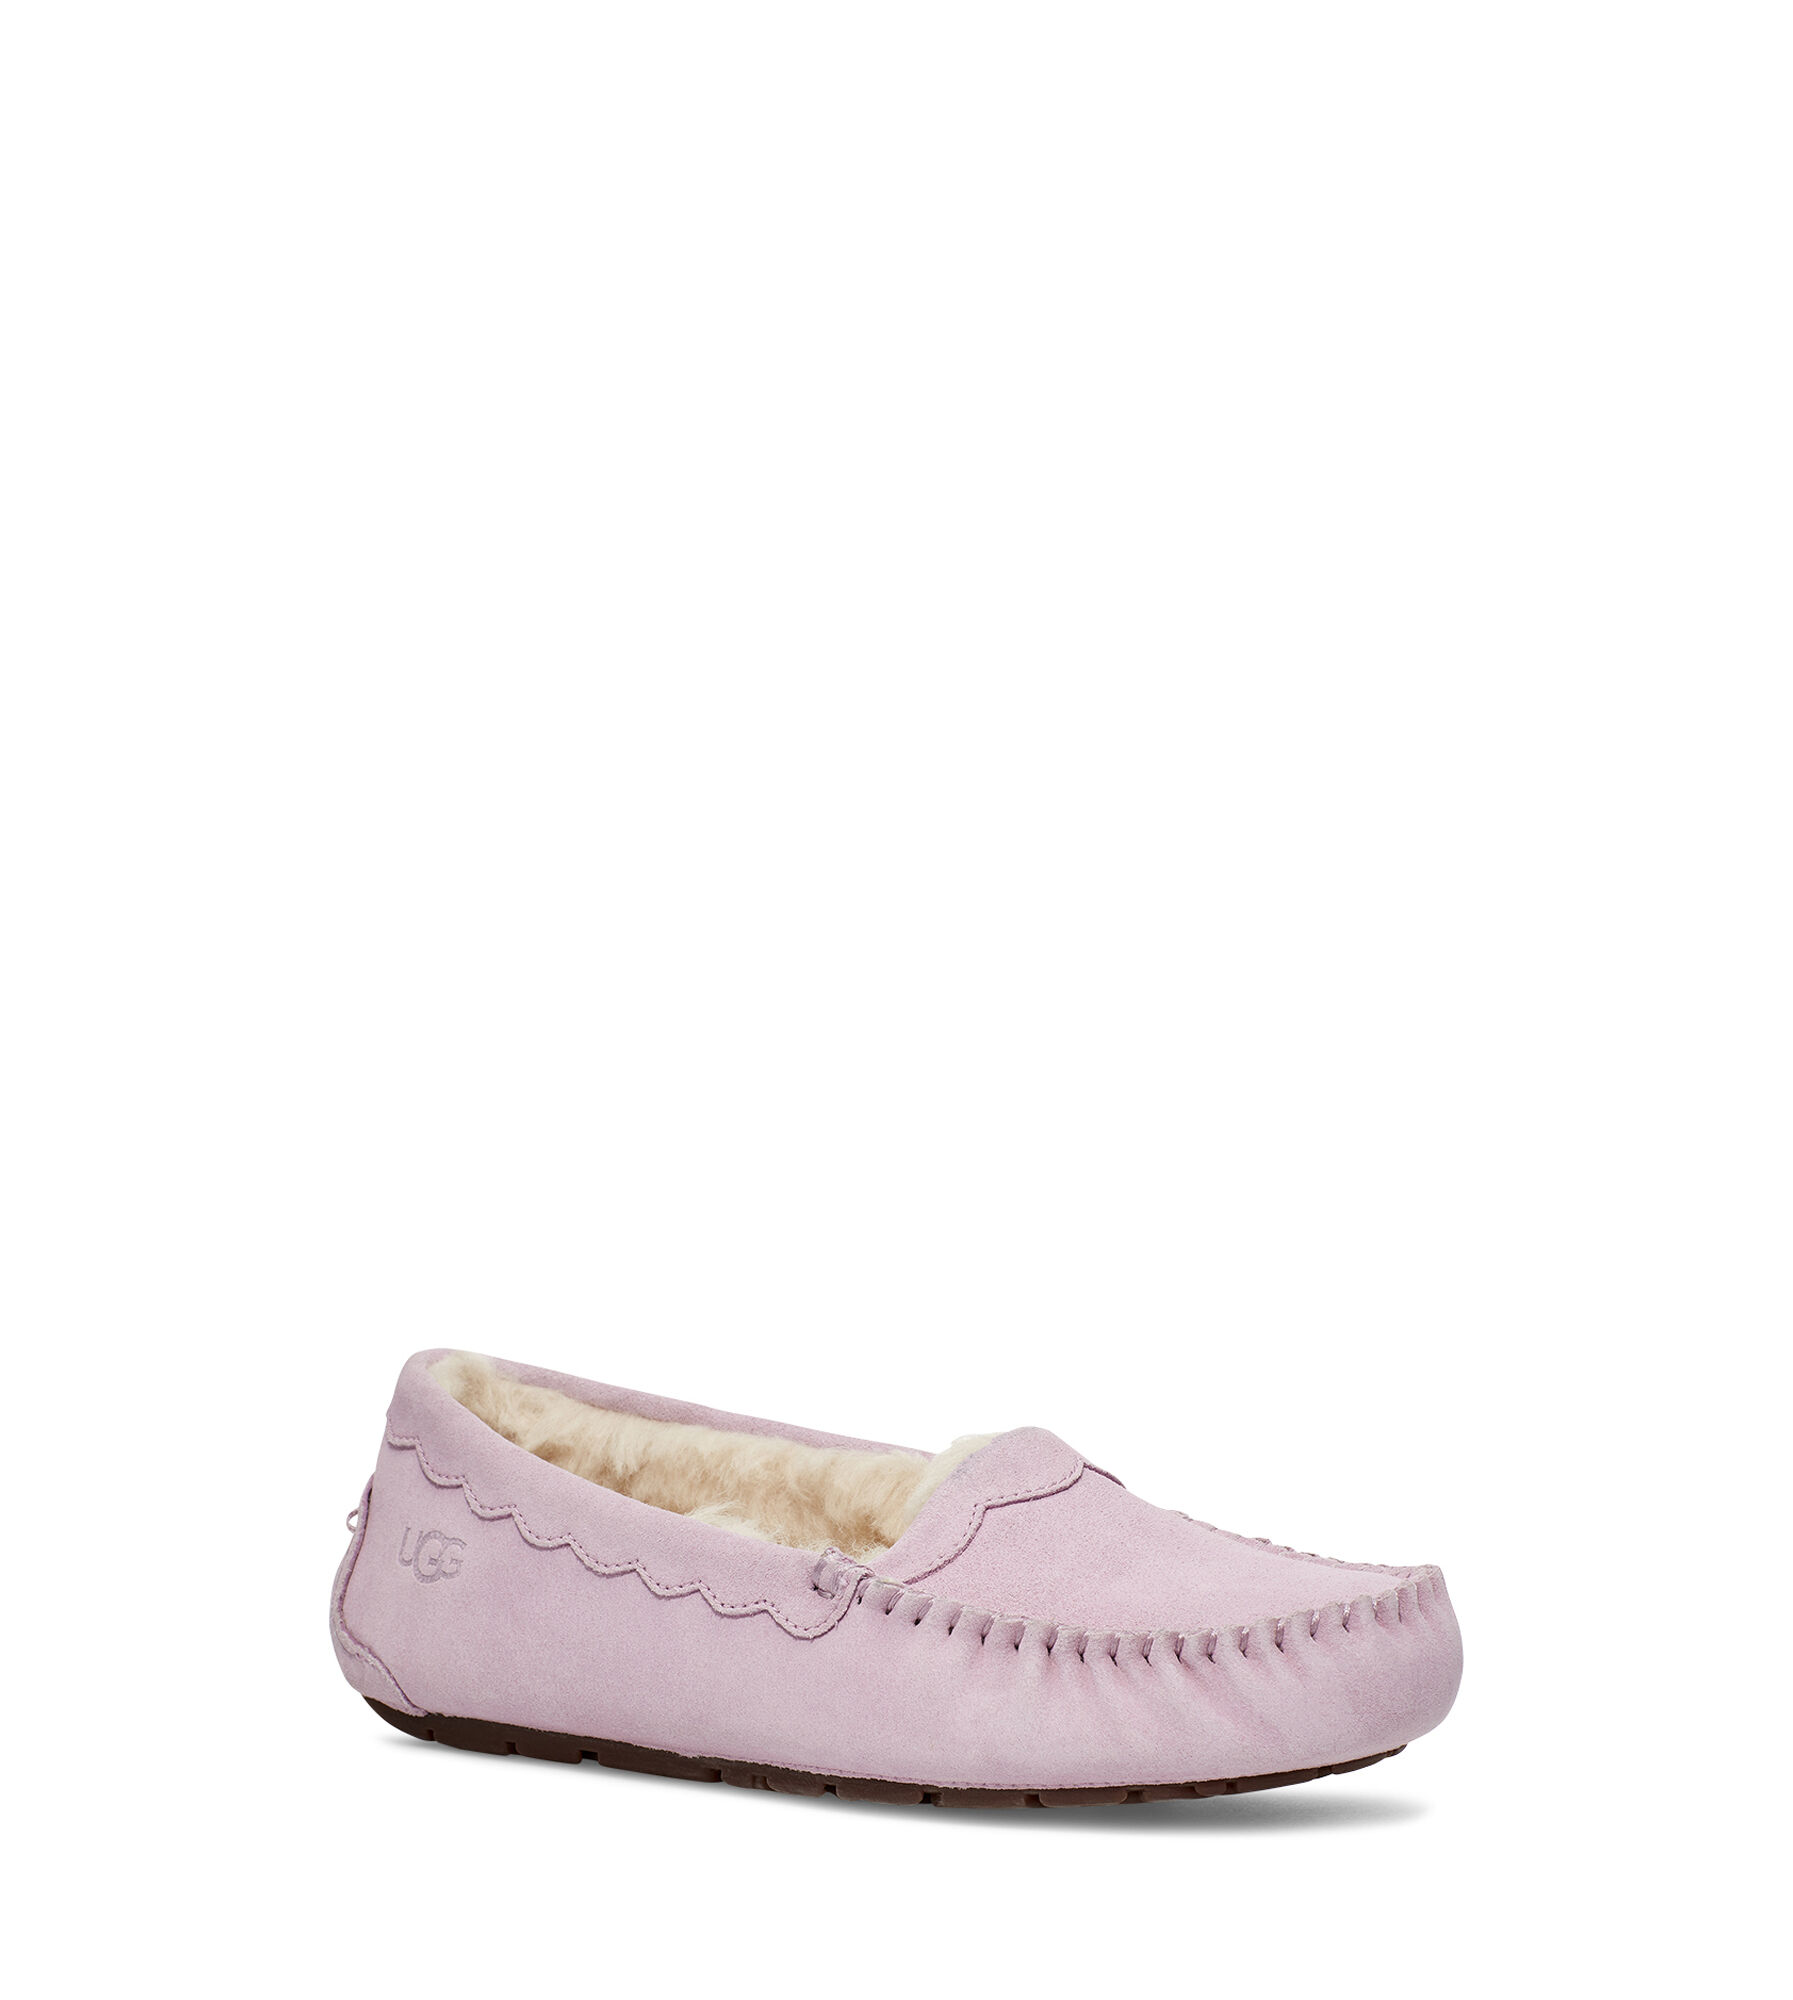 UGG® Scalloped Moc Slippers for Women